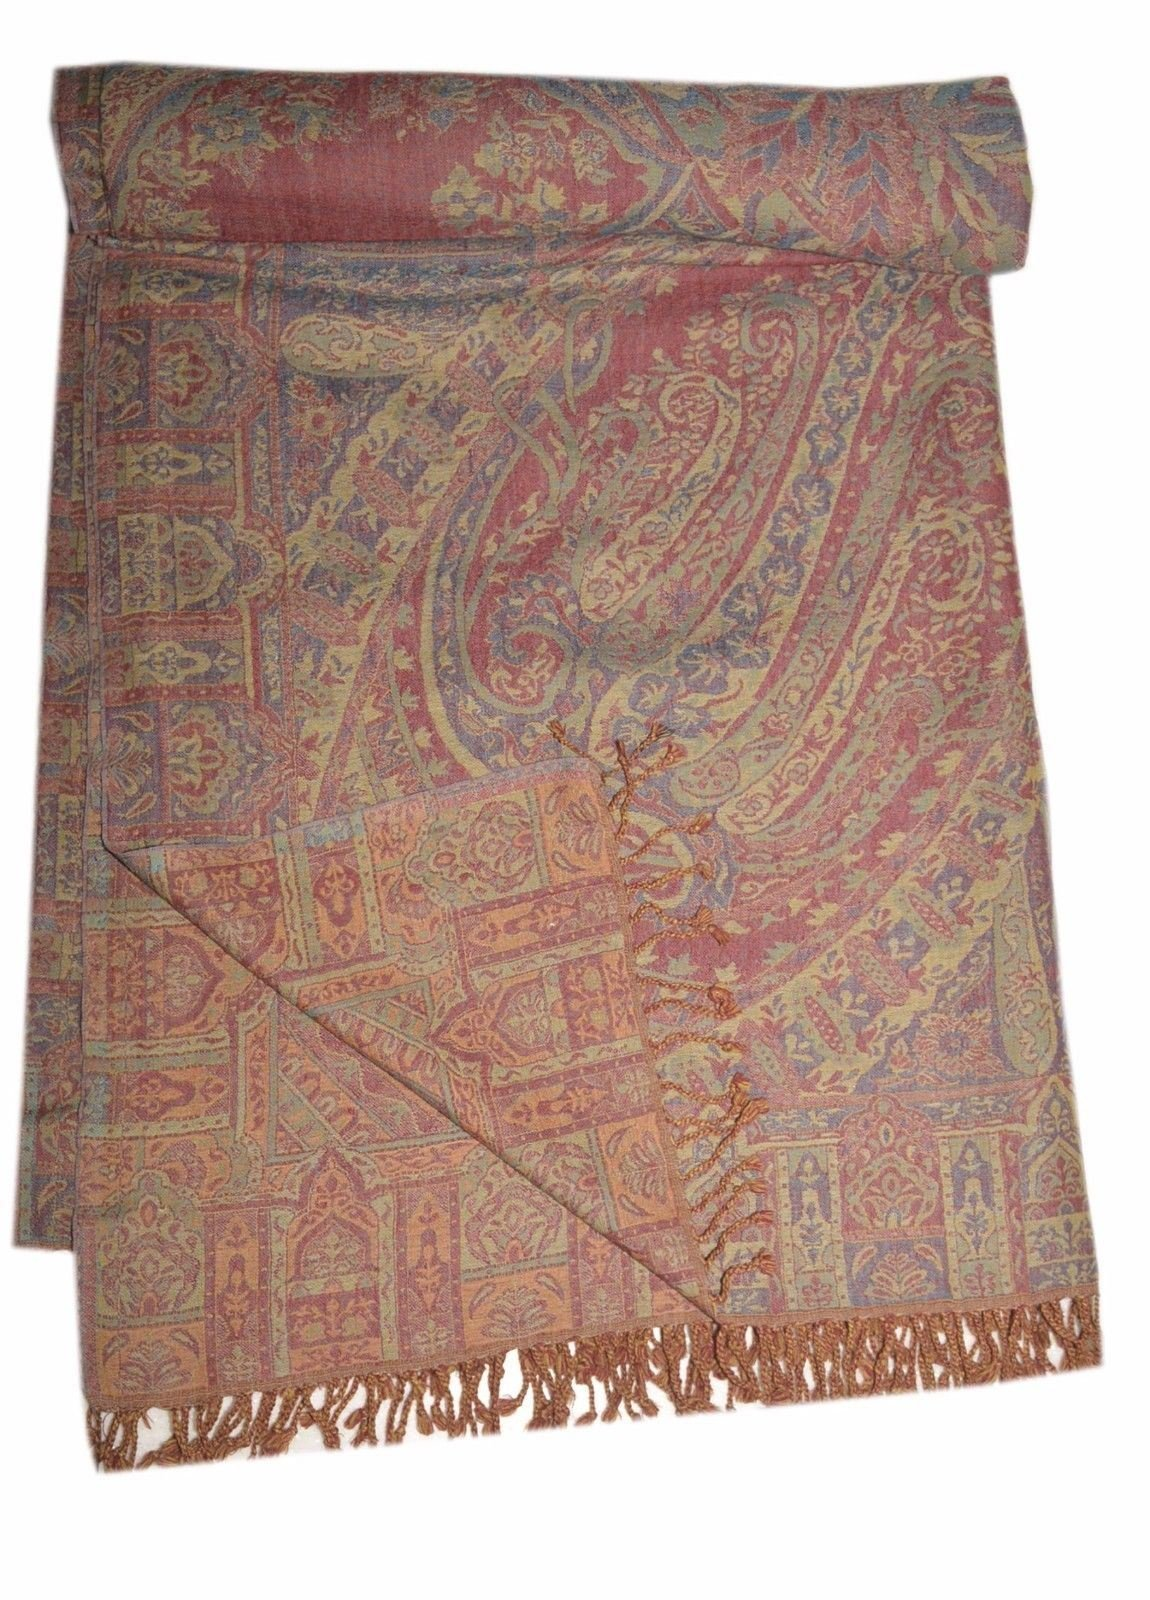 Pashmina Blanket Throw Reversible India Bedding King SL874